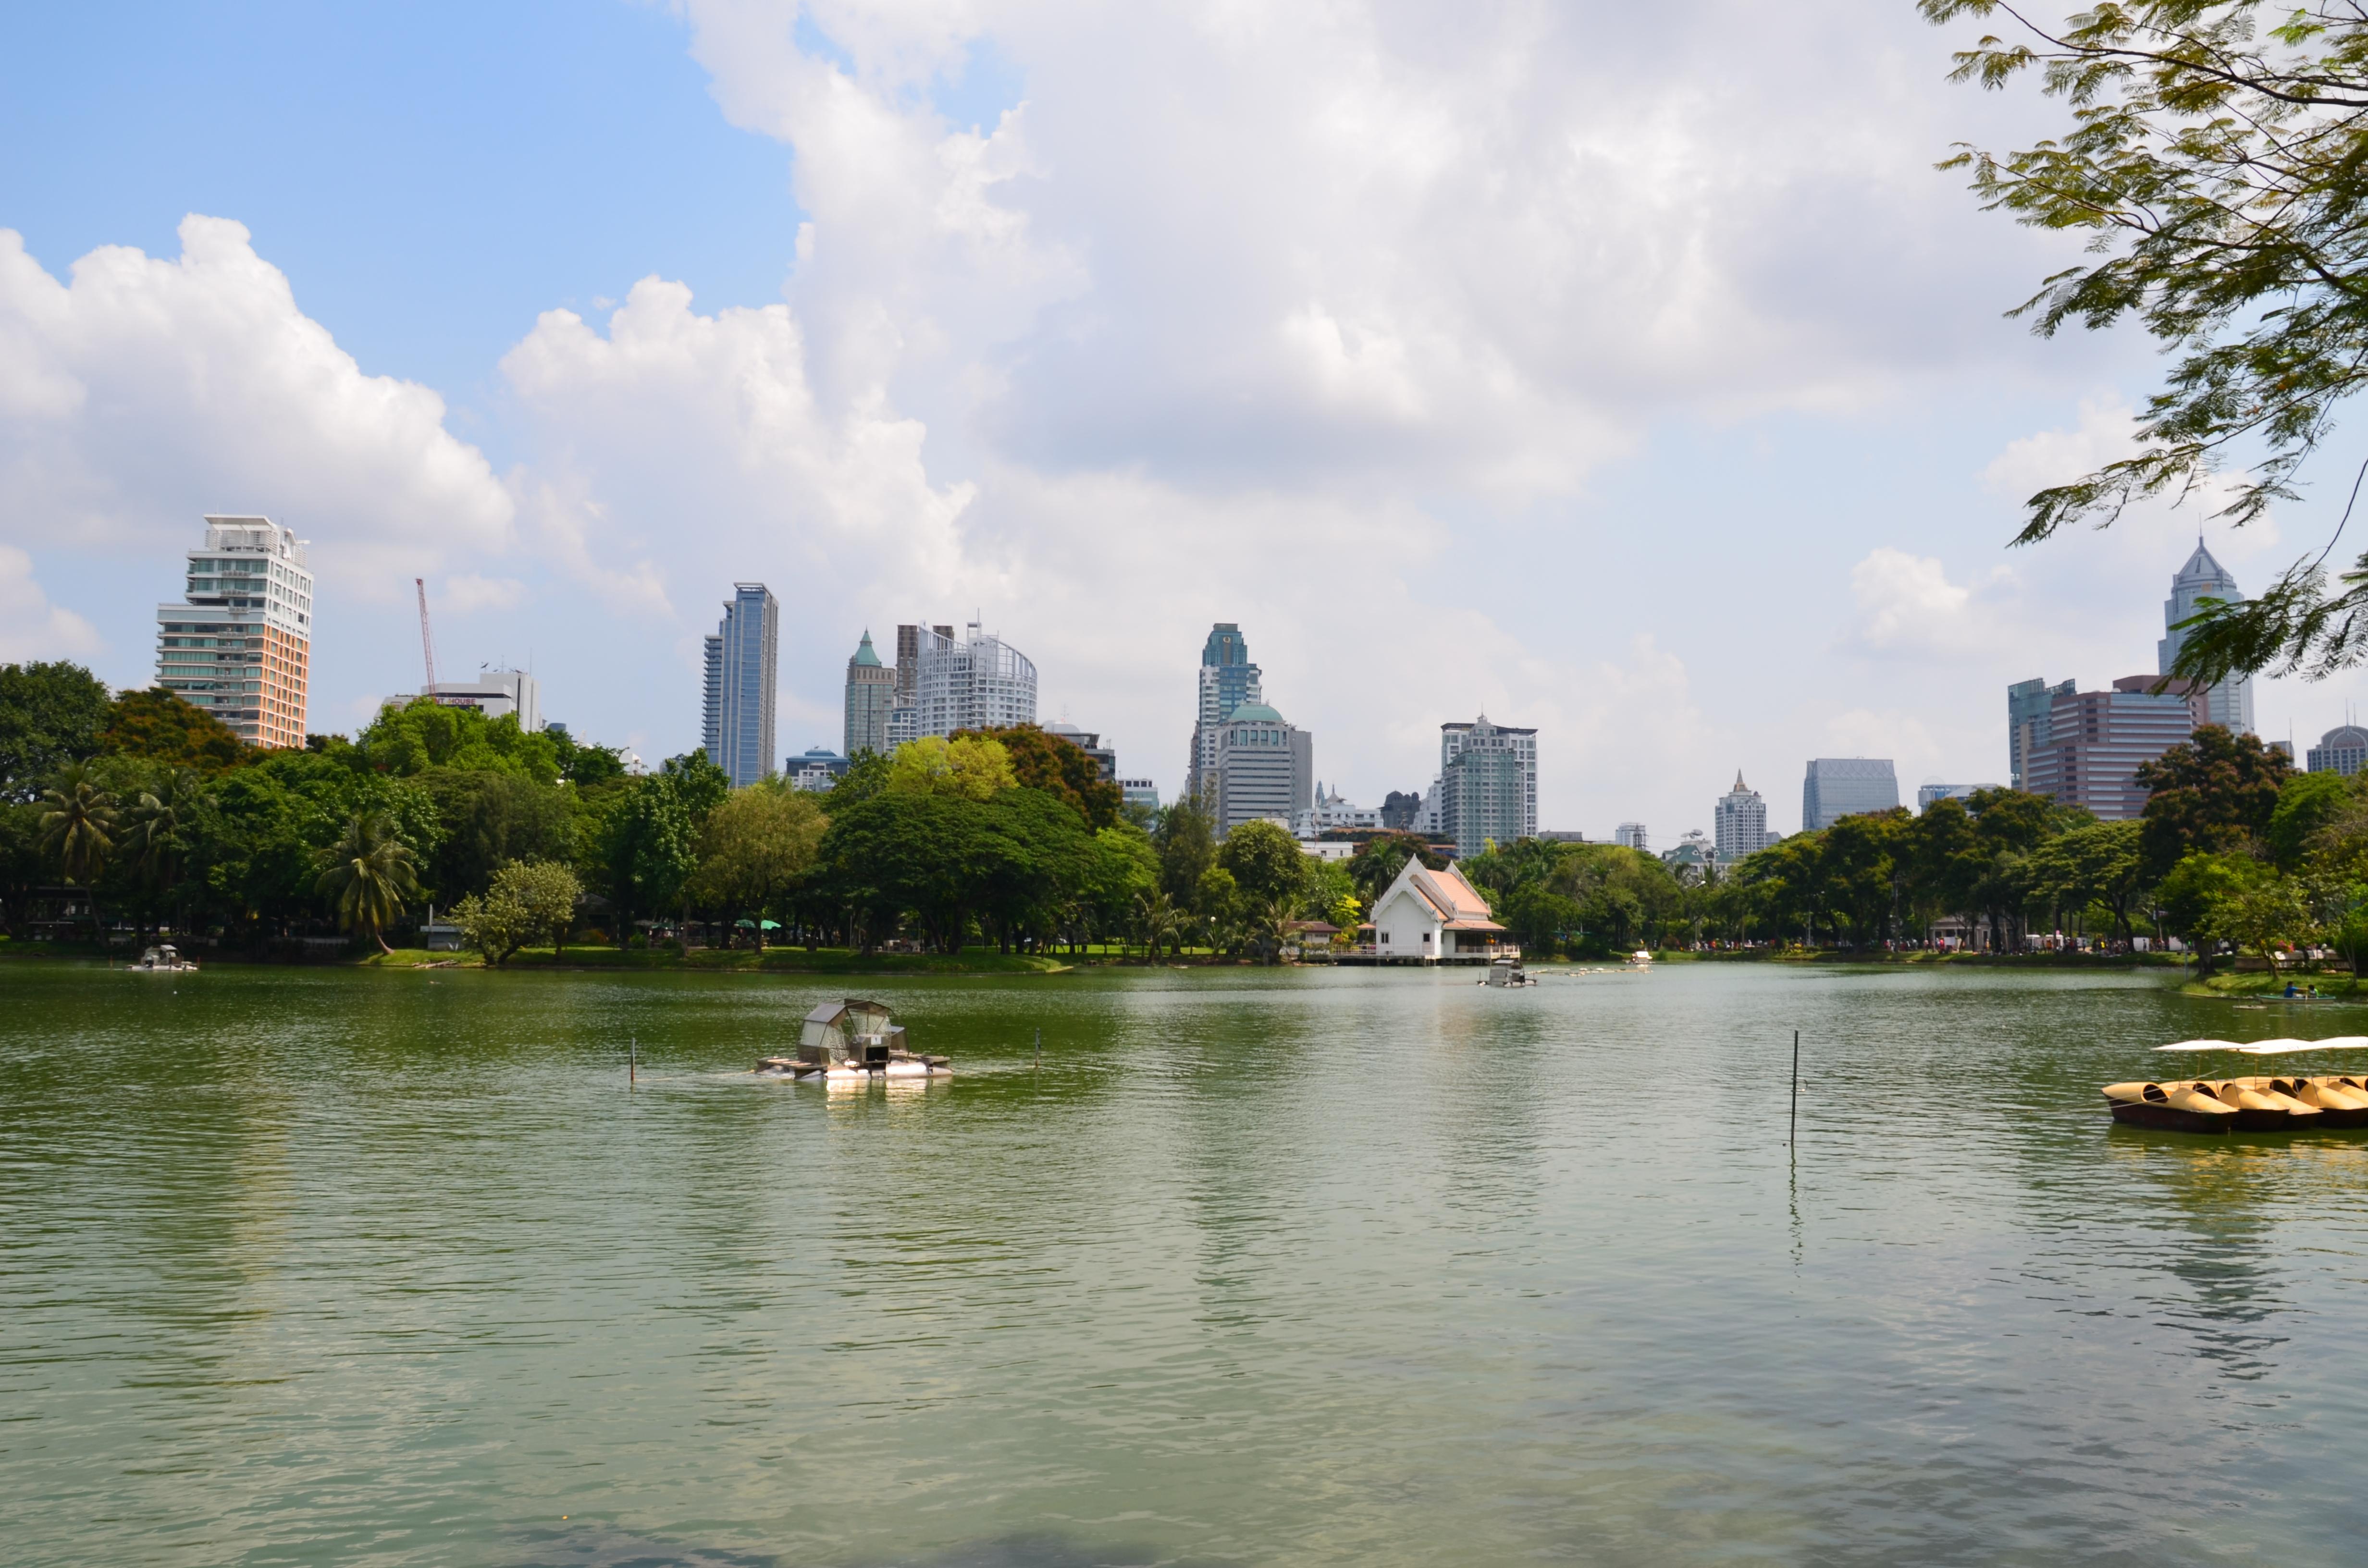 File:Lumpini Park, Bangkok, Thailand Ratchadamri-Ratchaphrasong Commercial Di...